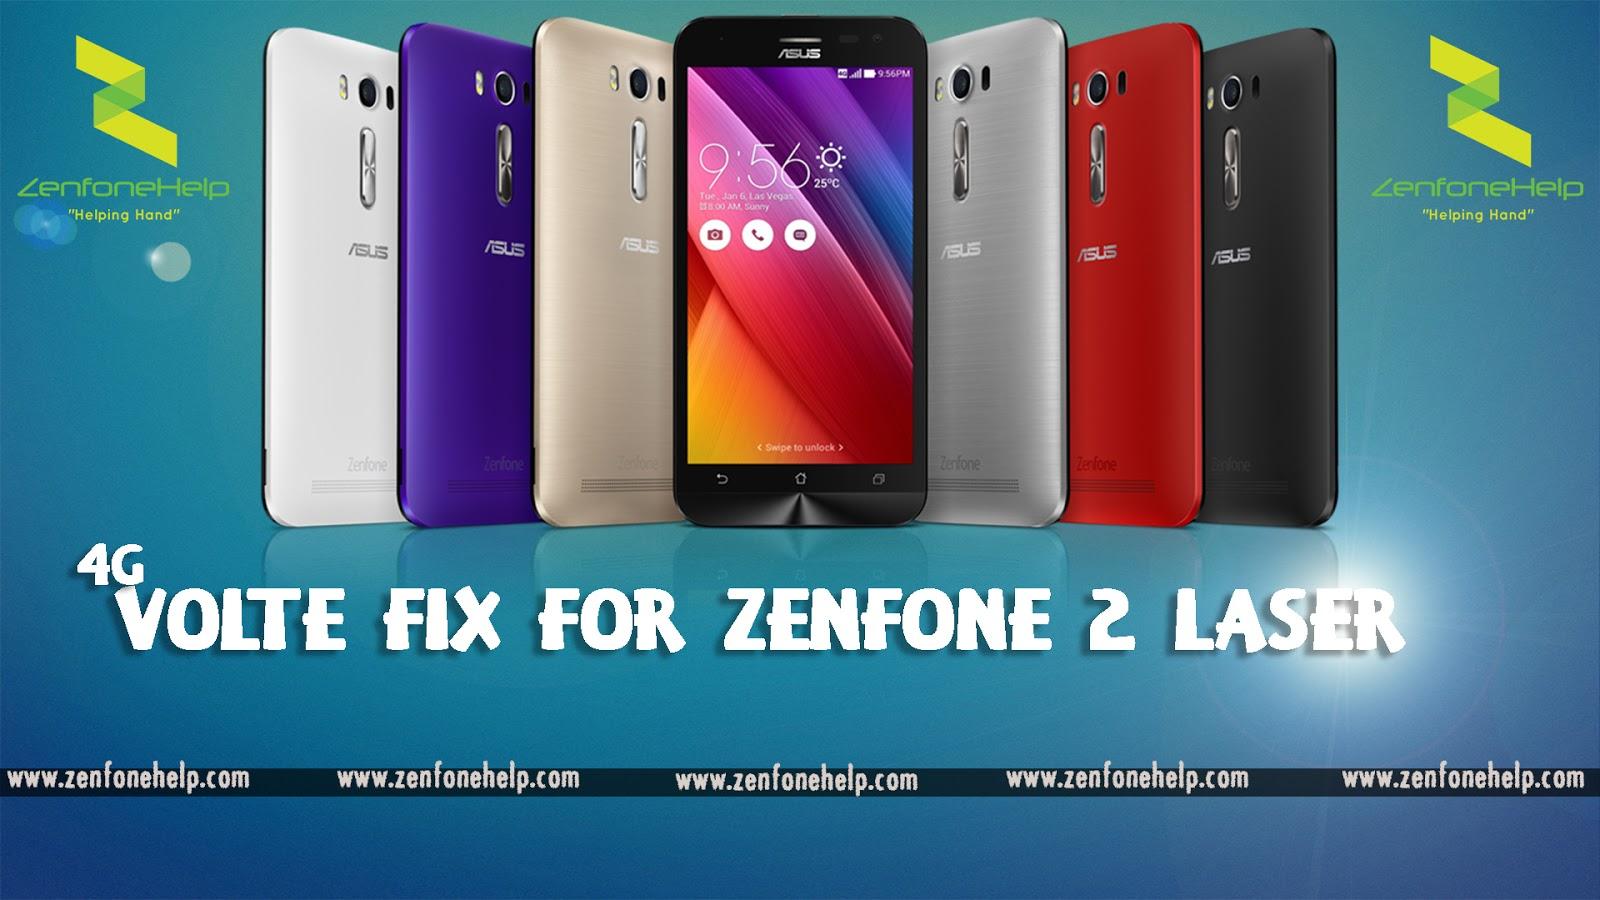 VoLTE fix for Zenfone Laser ZE550K   ZenFone Help